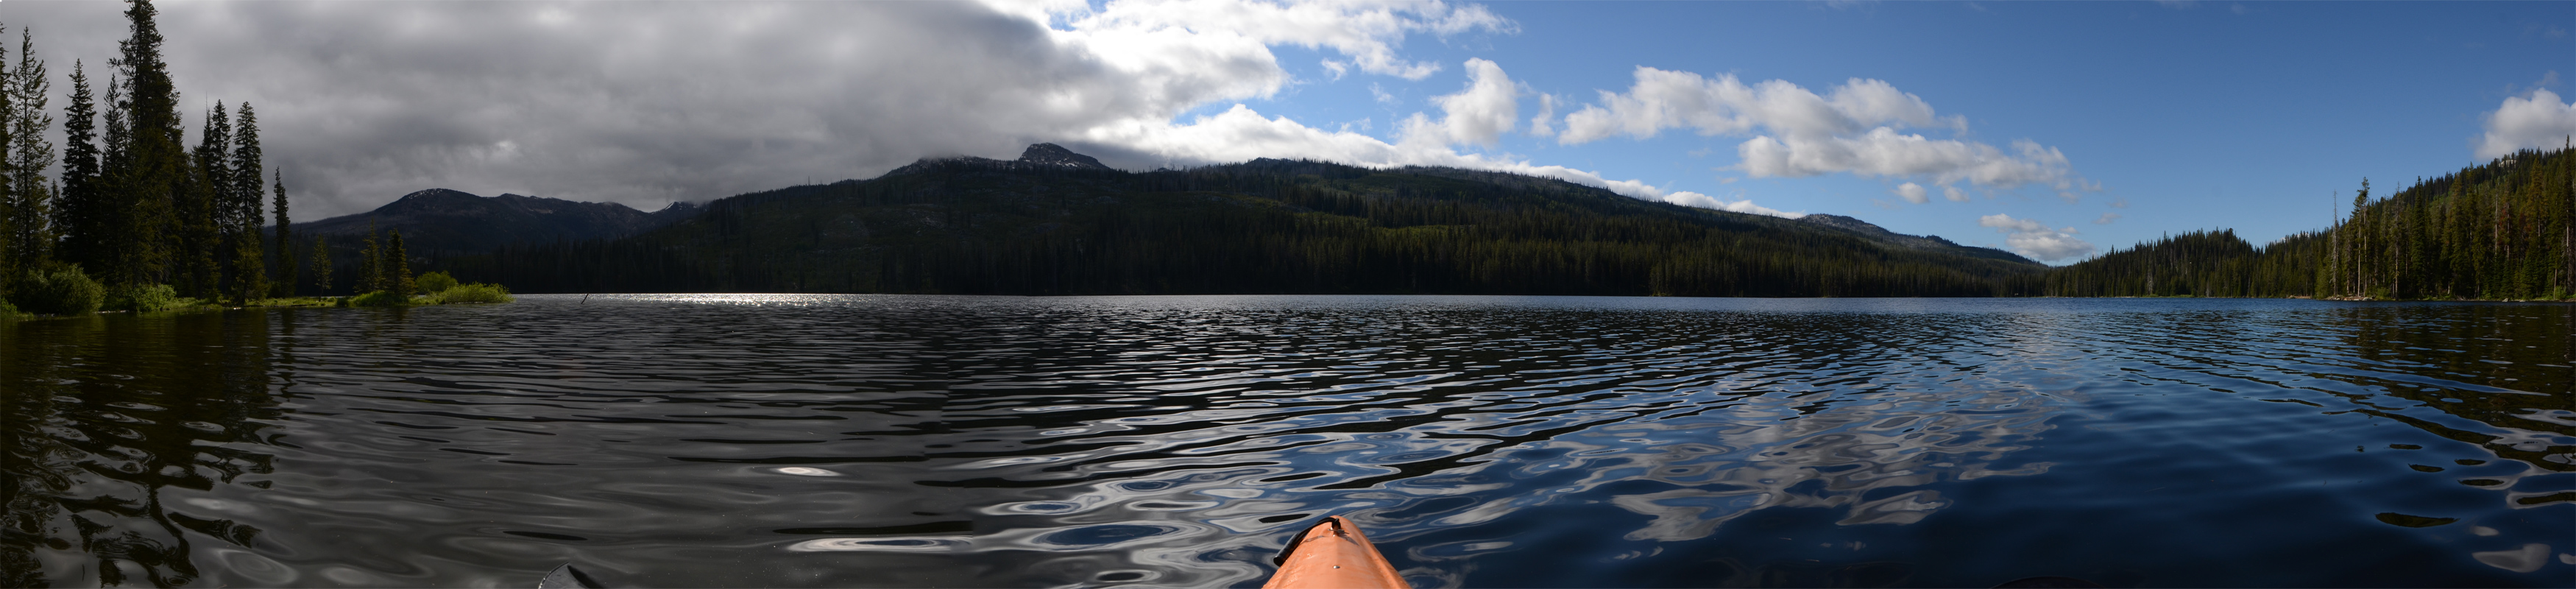 Upper Payette Lake Kayaking by eRality